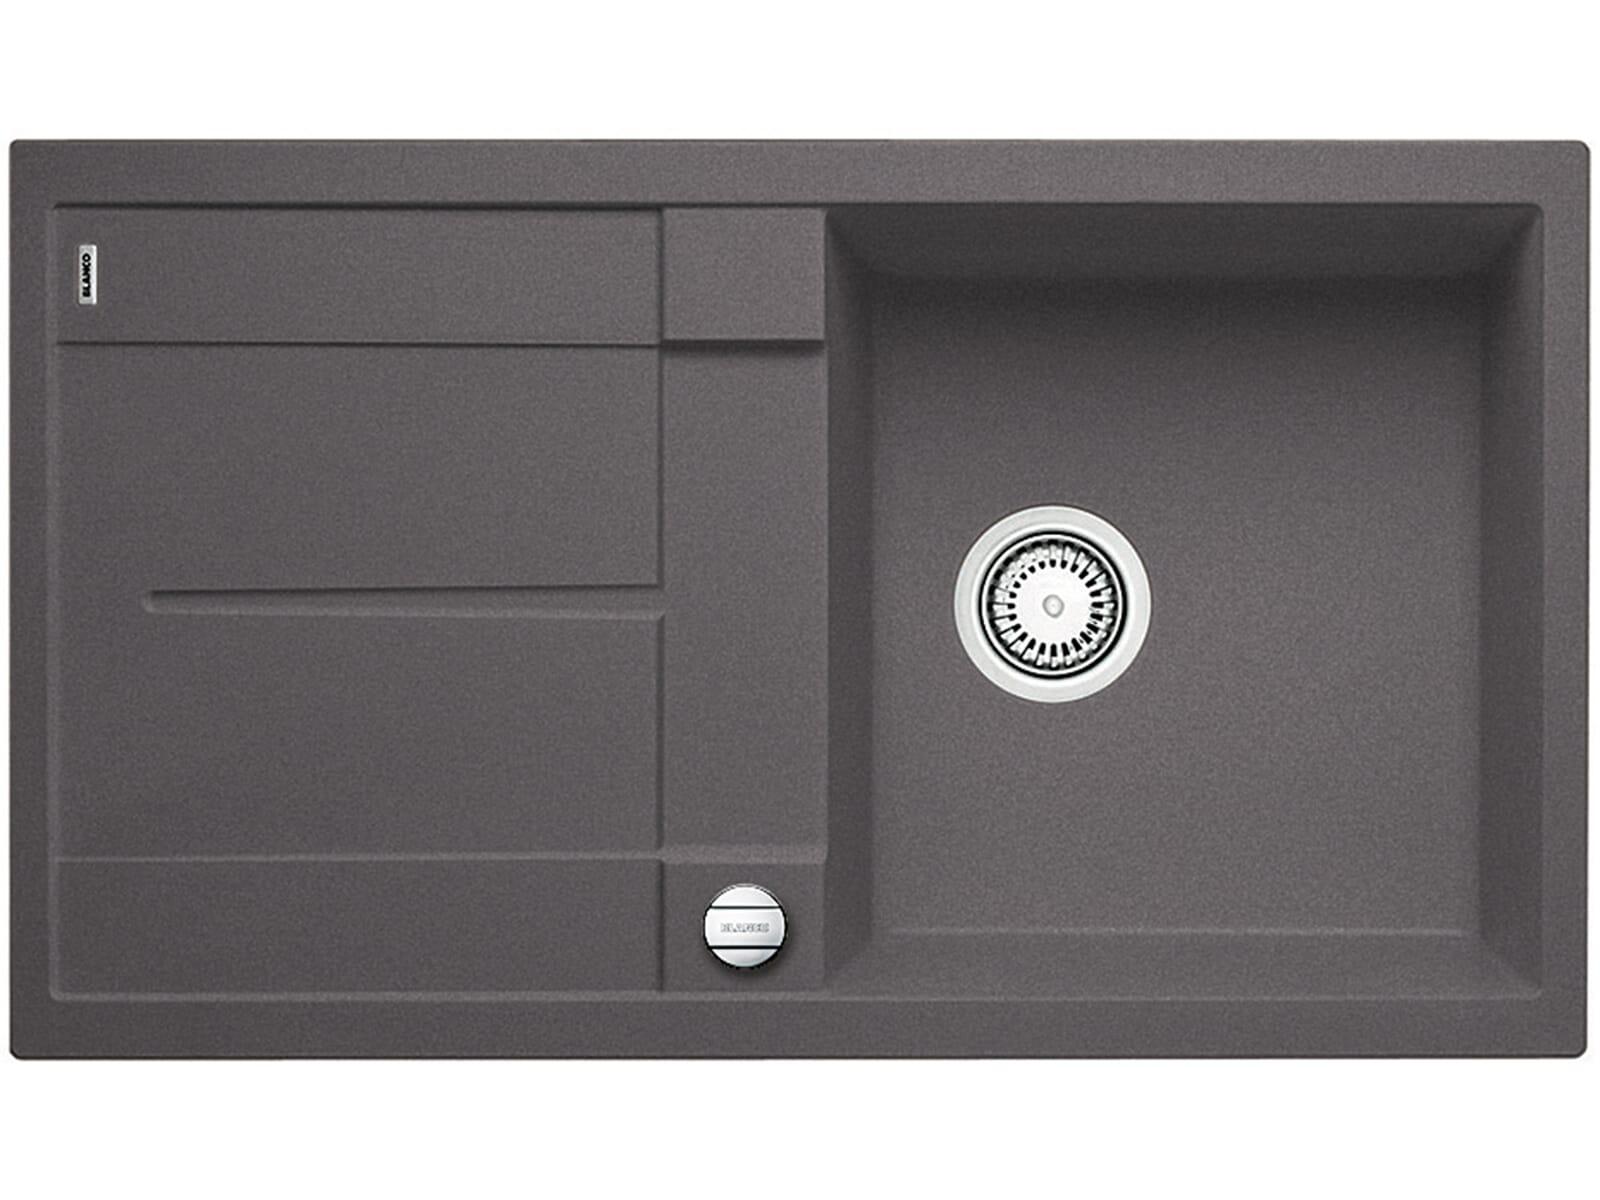 blanco metra 5 s f felsgrau granit sp le 50er us dunkelgrau fl chenb ndig ebay. Black Bedroom Furniture Sets. Home Design Ideas